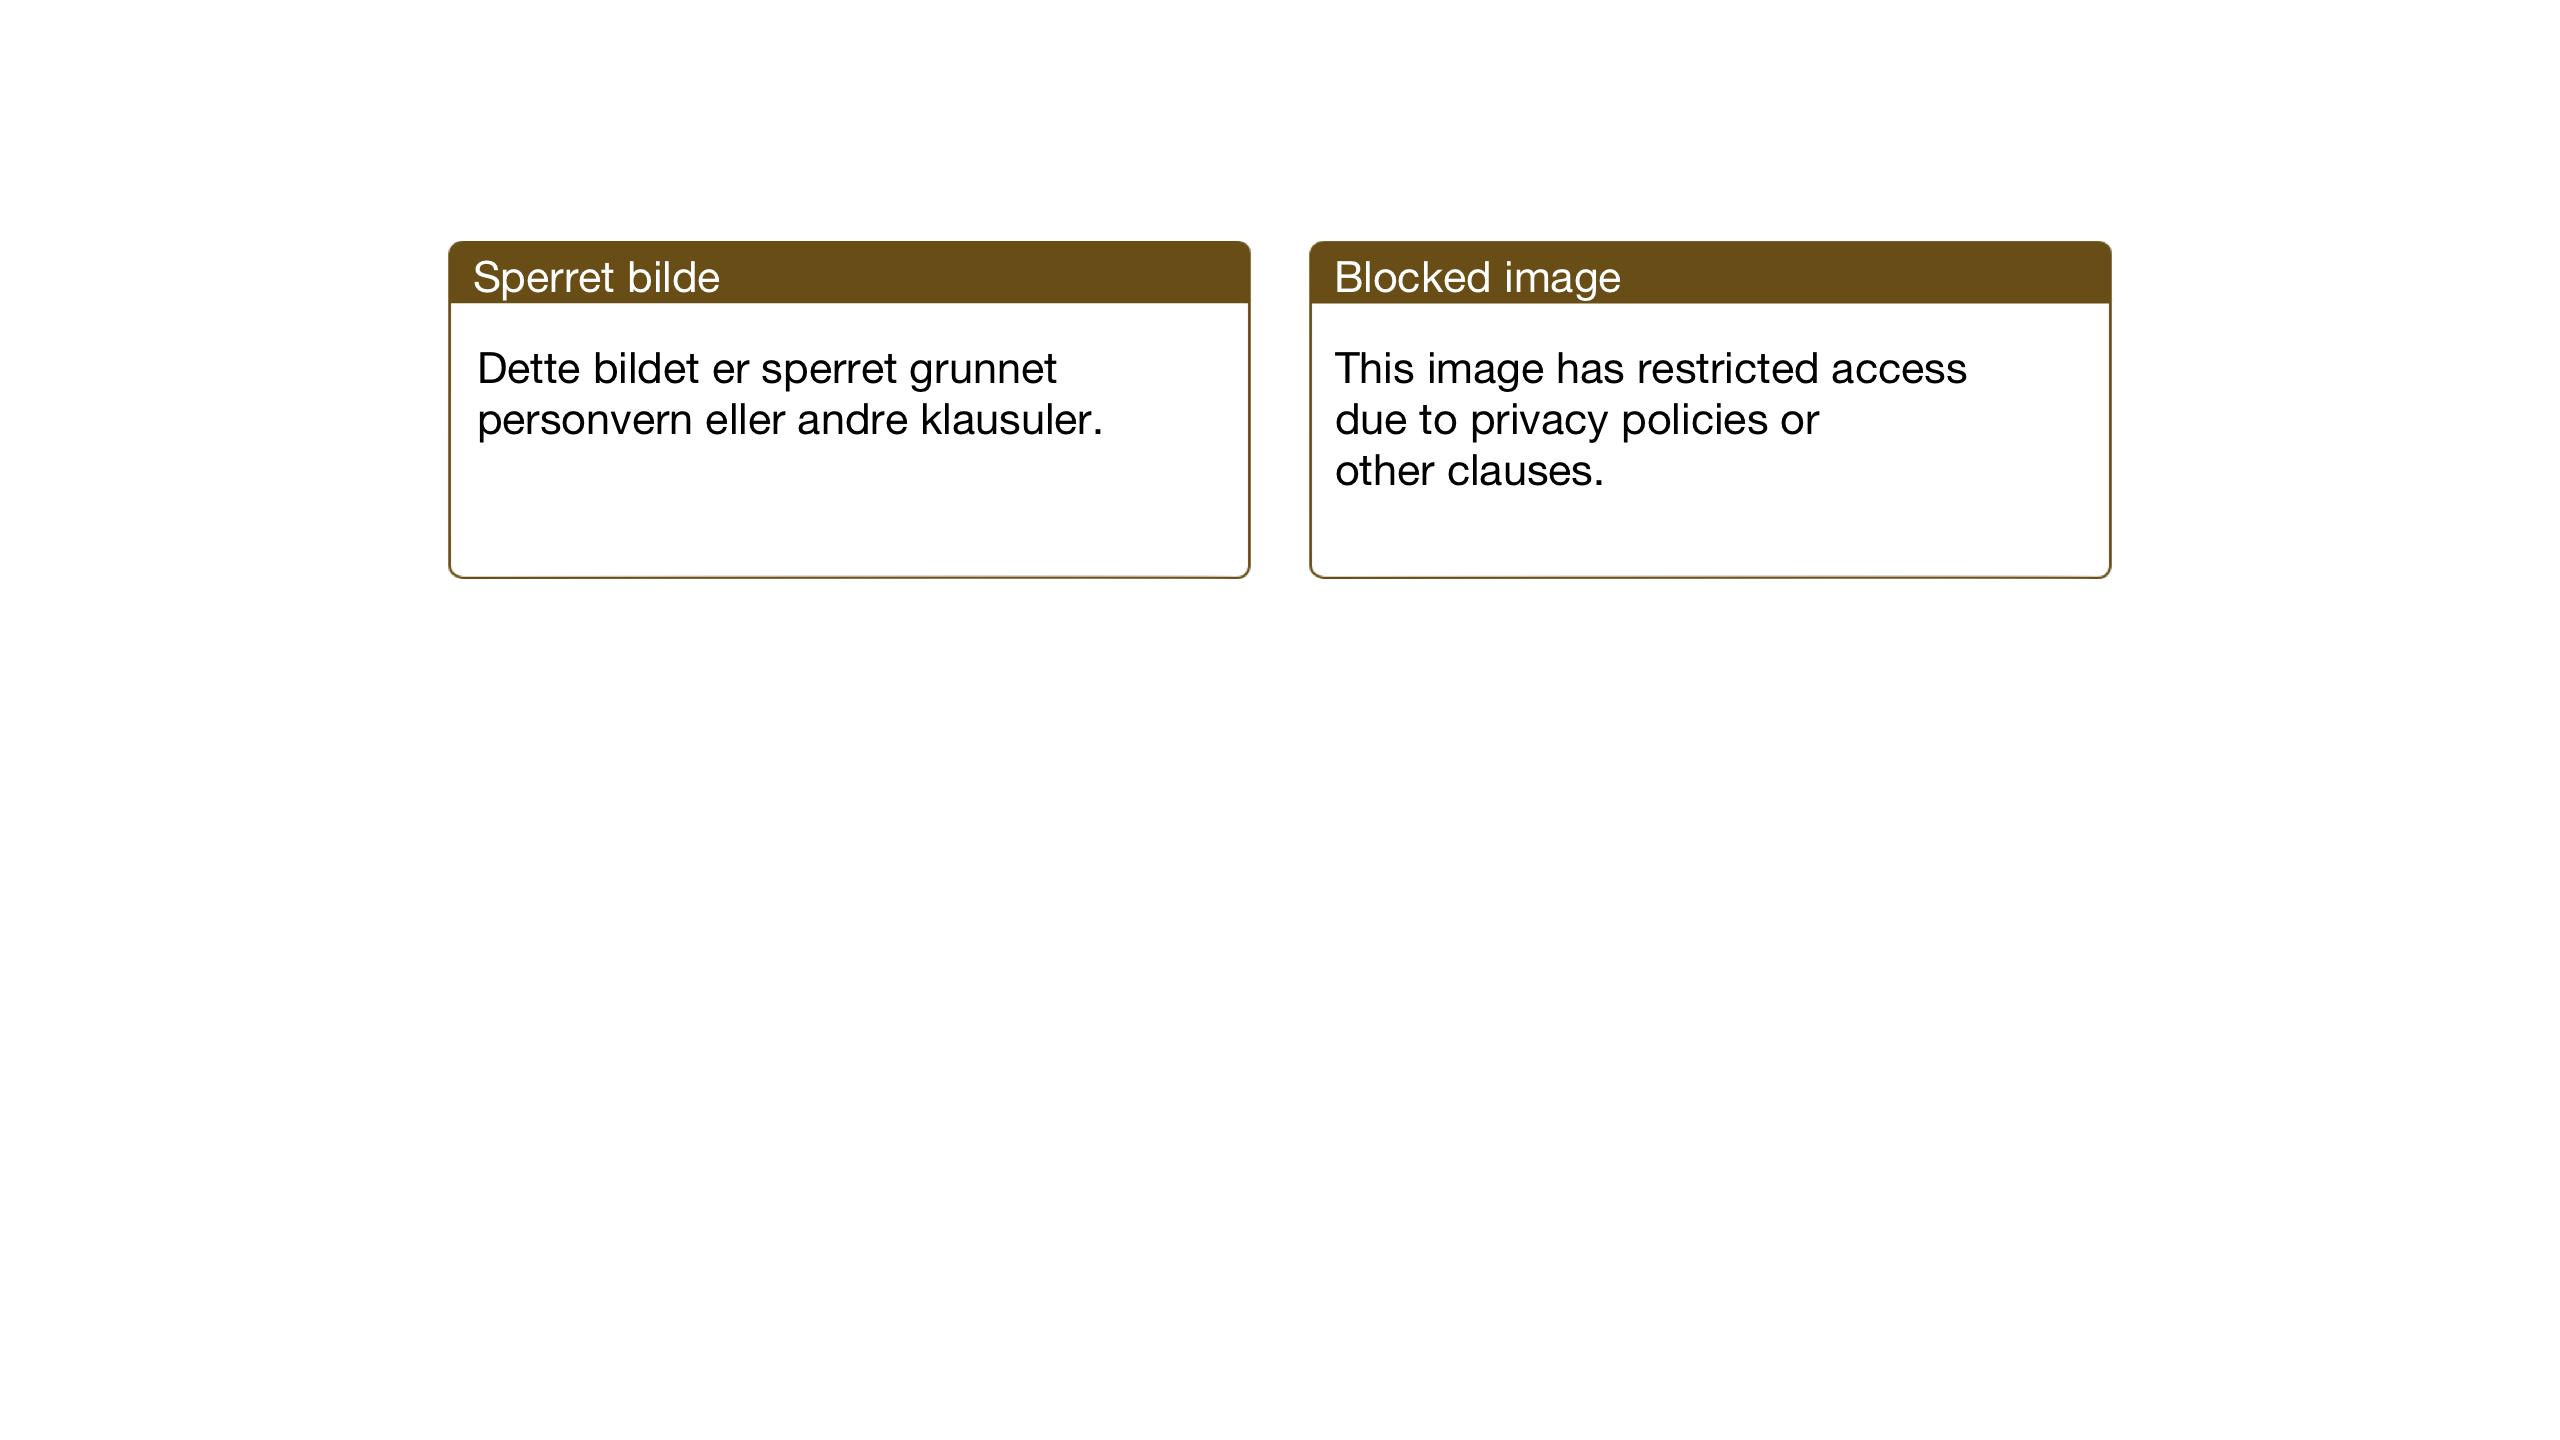 SAB, Domkirken Sokneprestembete, H/Haa: Ministerialbok nr. C 9, 1958-2001, s. 8b-9a